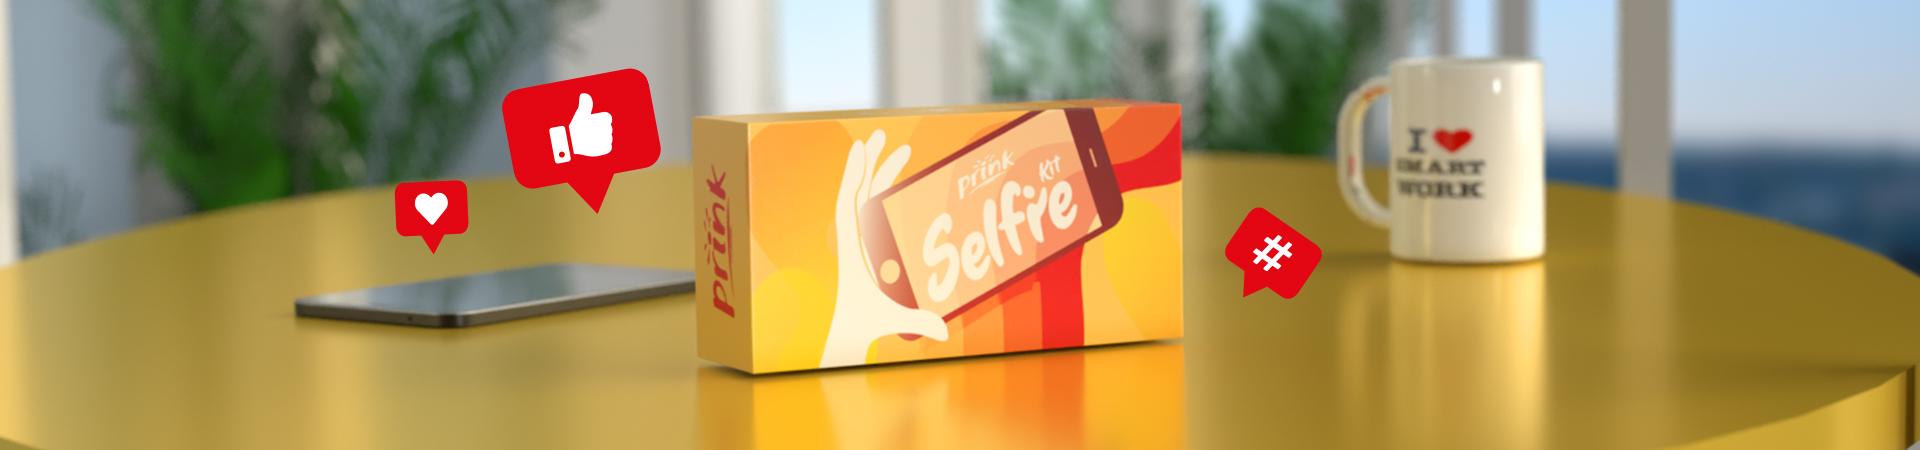 Selfie Kit in omaggio con cartucce o toner Prink